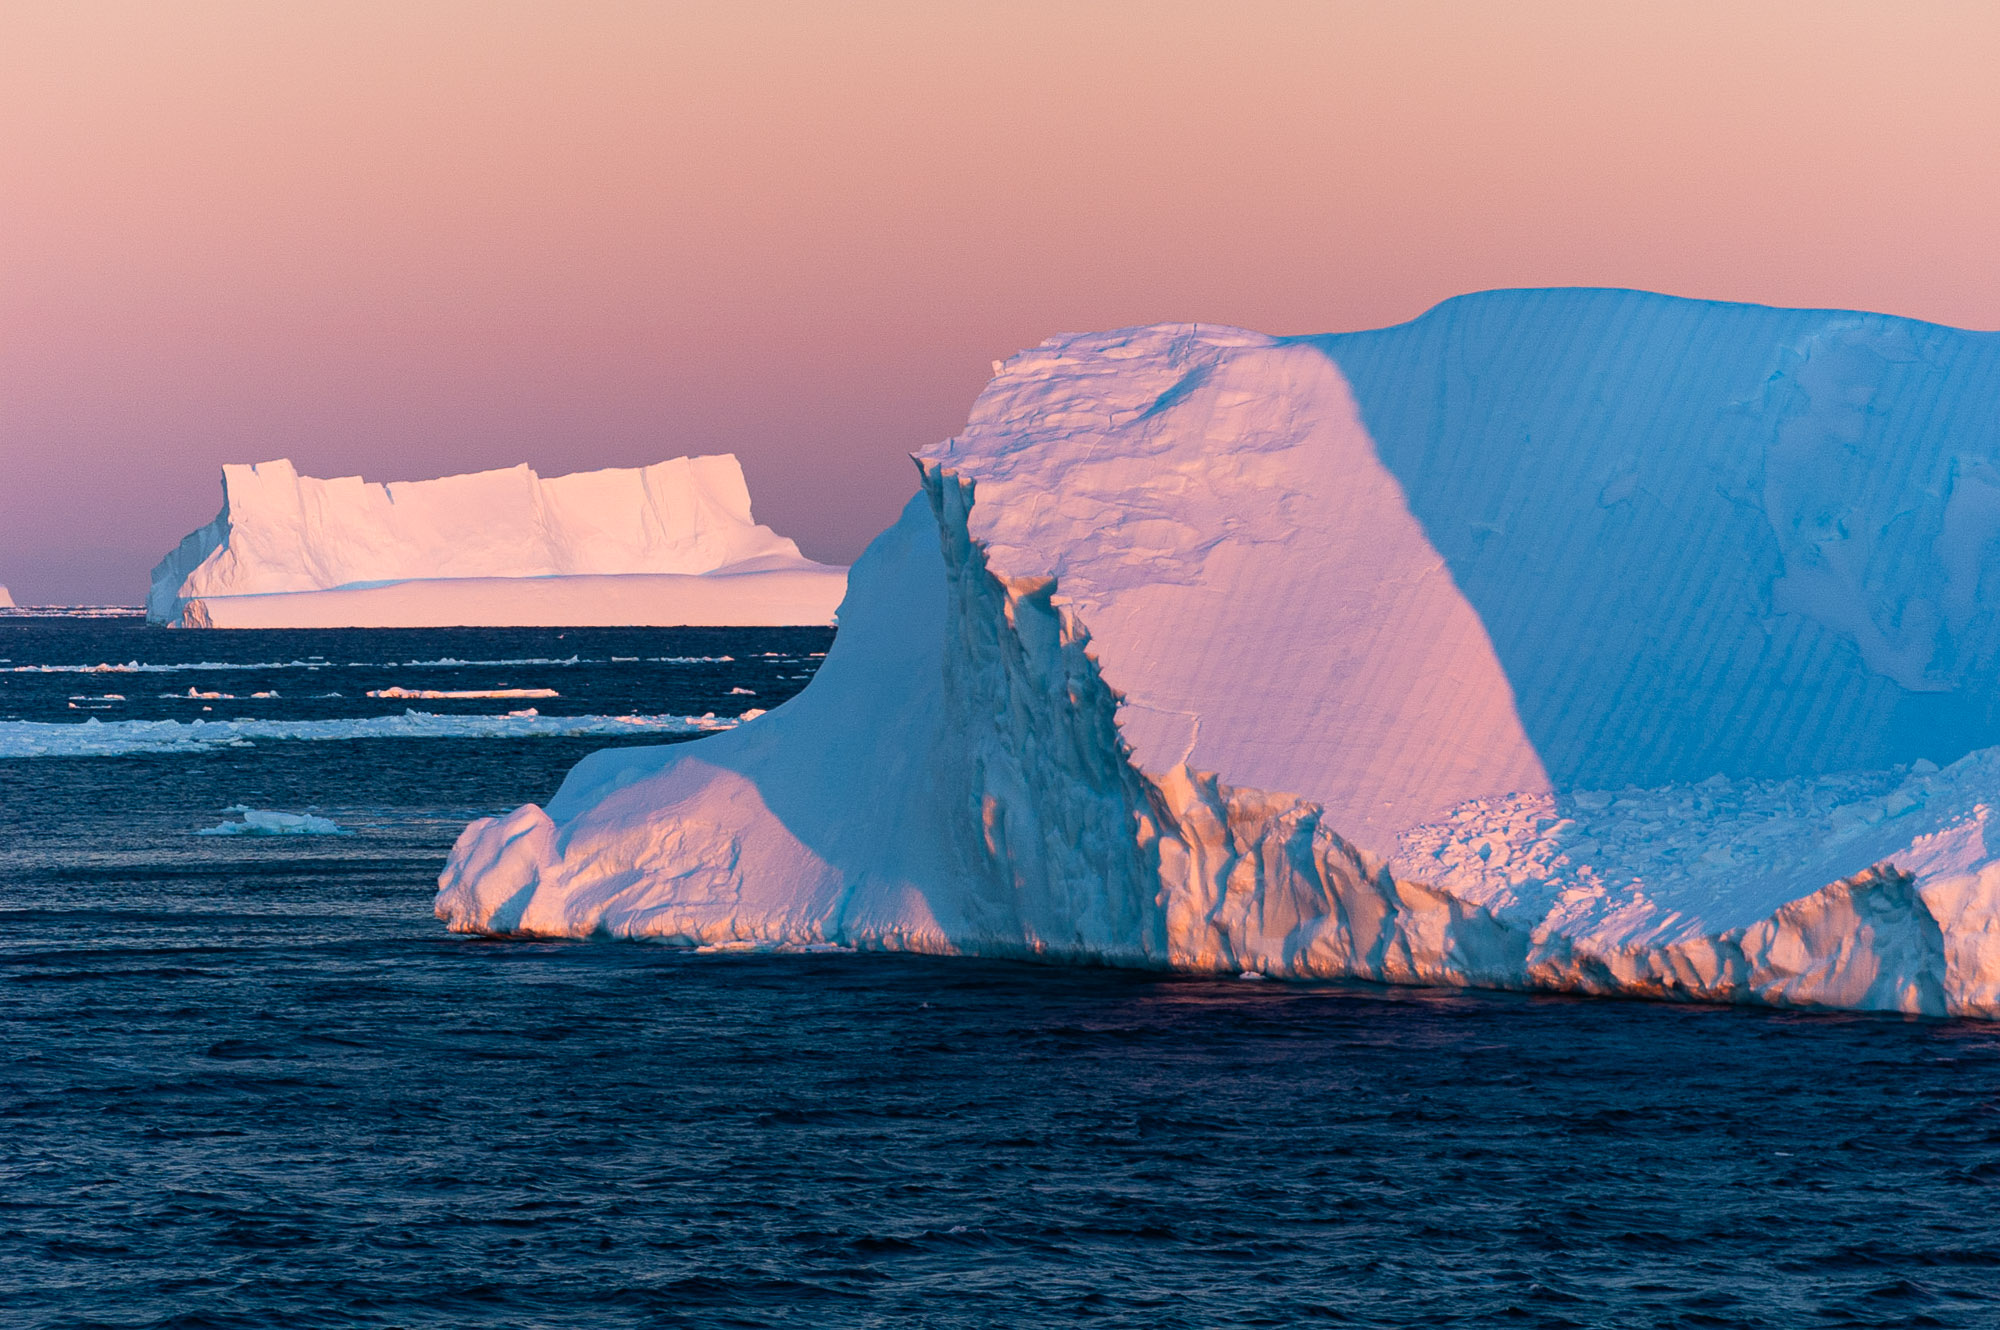 Icebergs, Antarctica. © www.thomaspickard.com